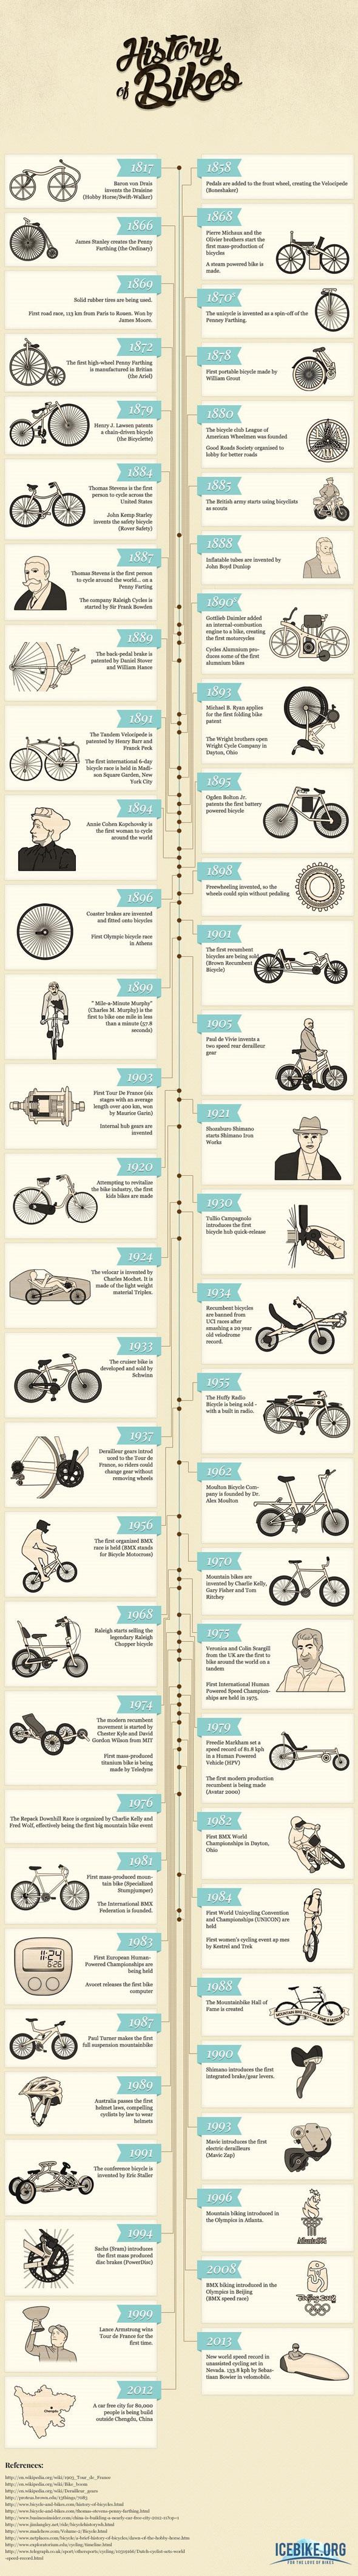 history-of-bikes